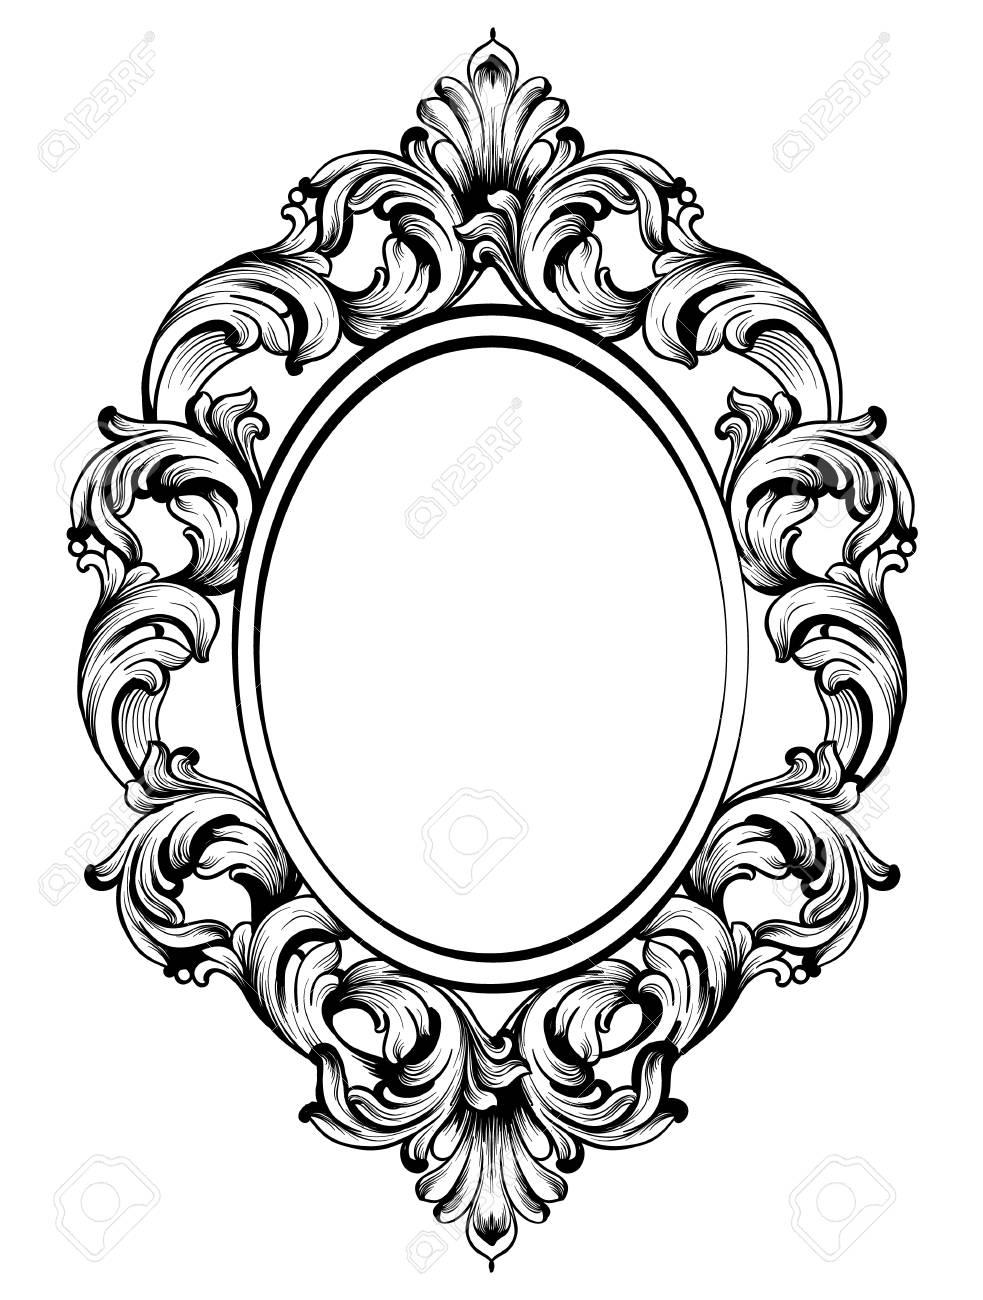 baroque frame decor detailed rich ornament vector illustration rh 123rf com free ornament vector png free ornament vector art